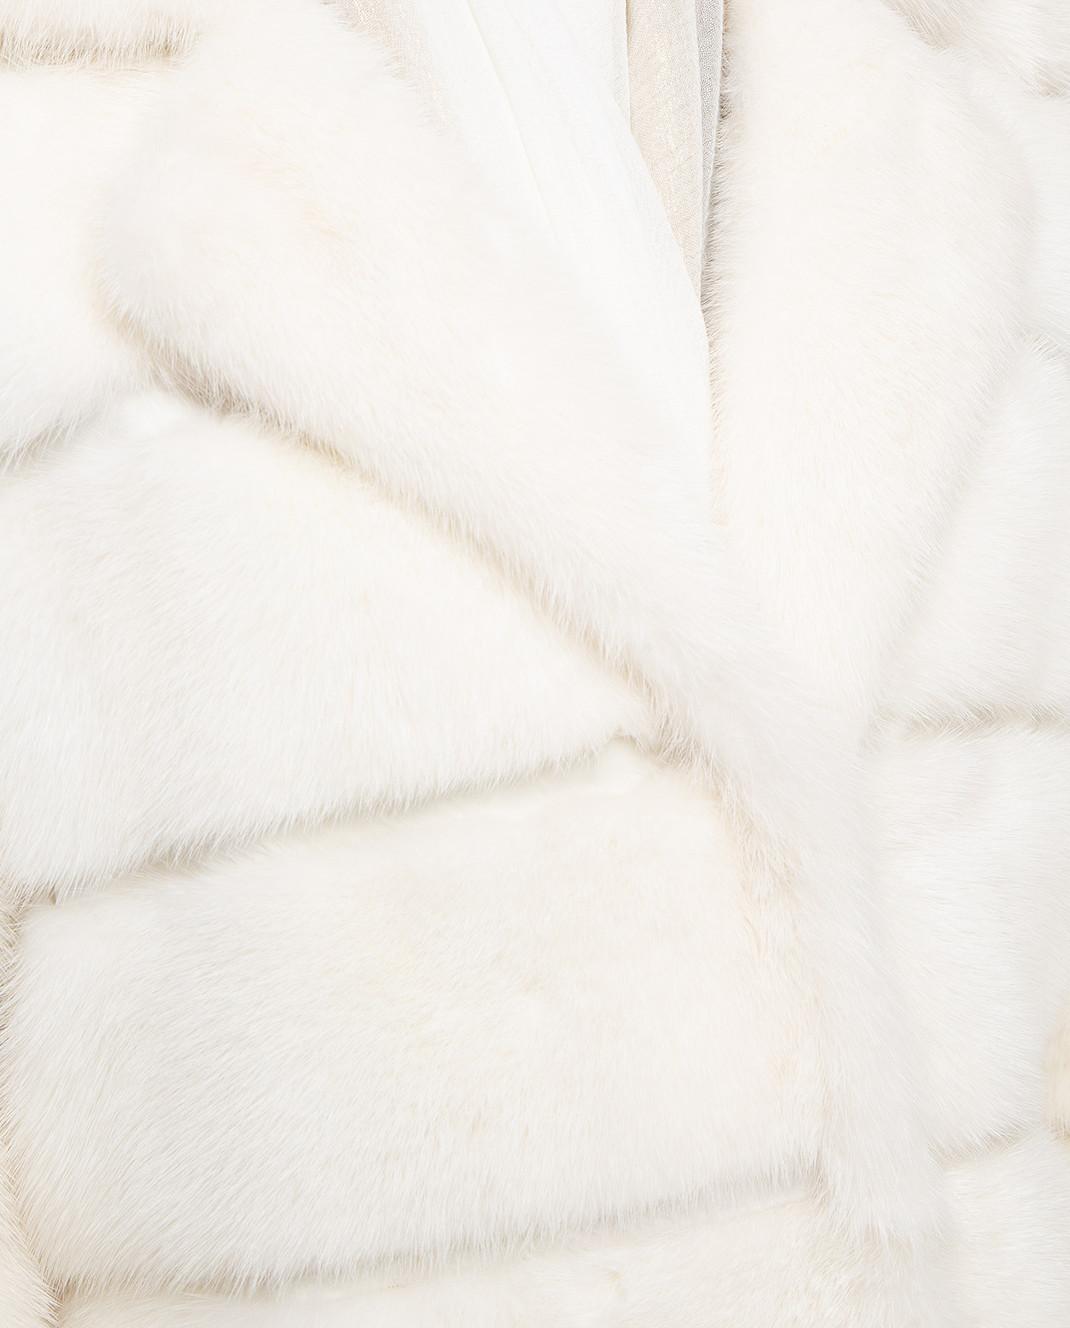 Annabella Белая шуба из норки 4MAGJ500 изображение 5